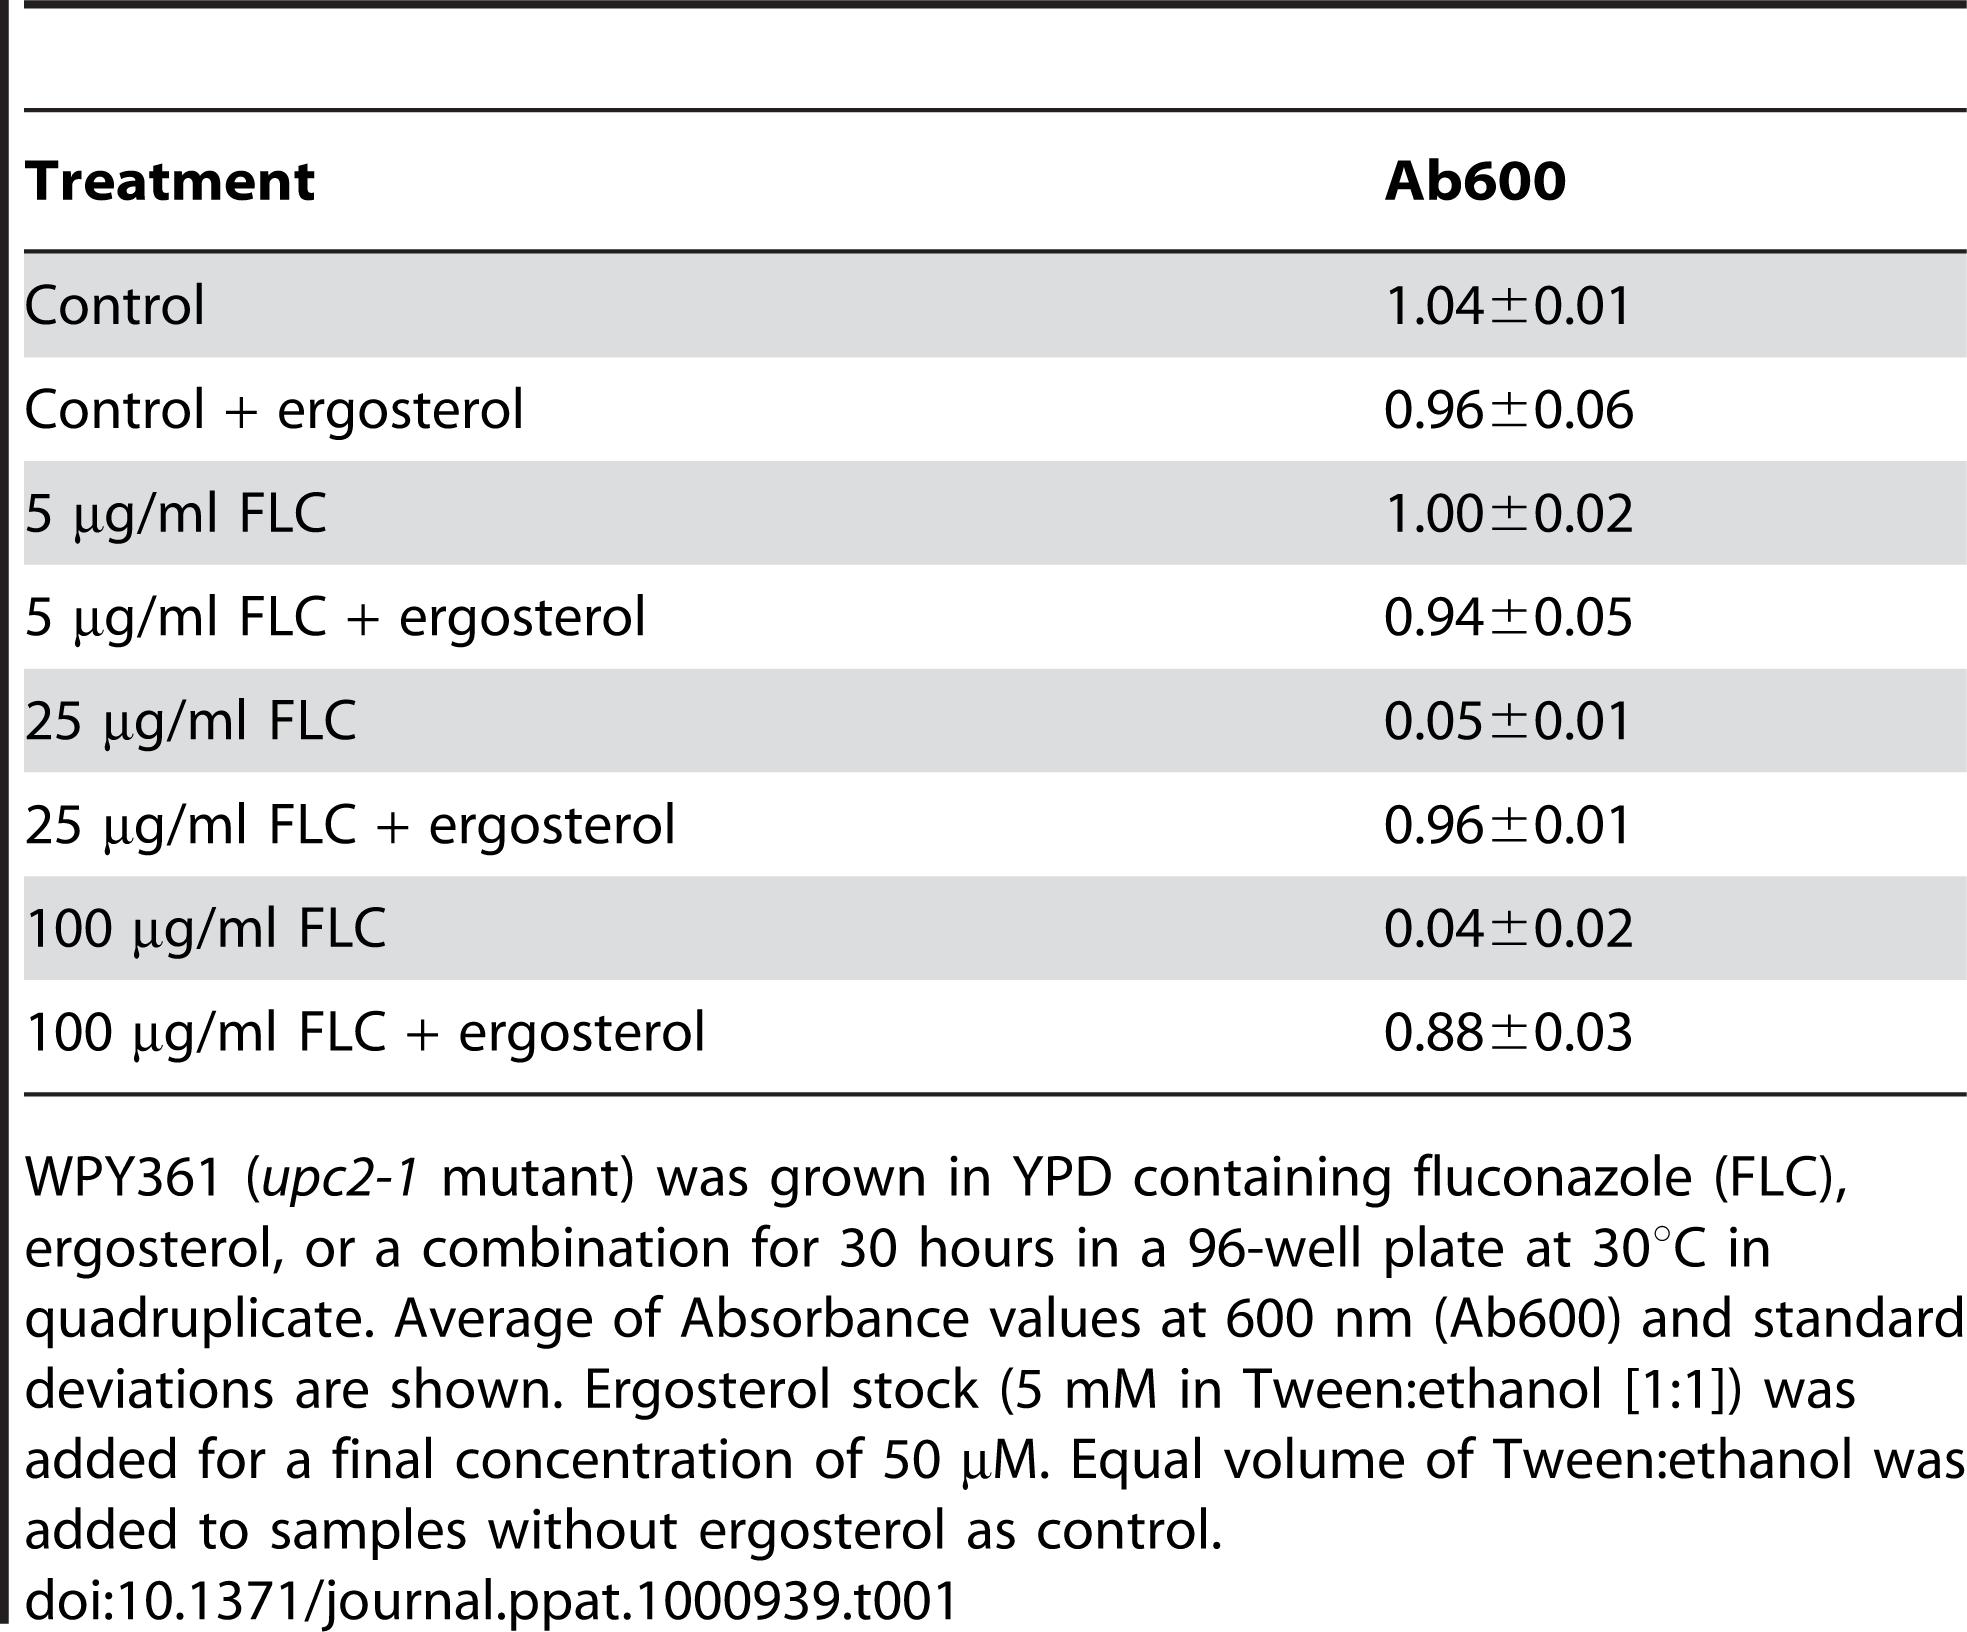 Ergosterol feeding relieves growth inhibition by fluconazole.